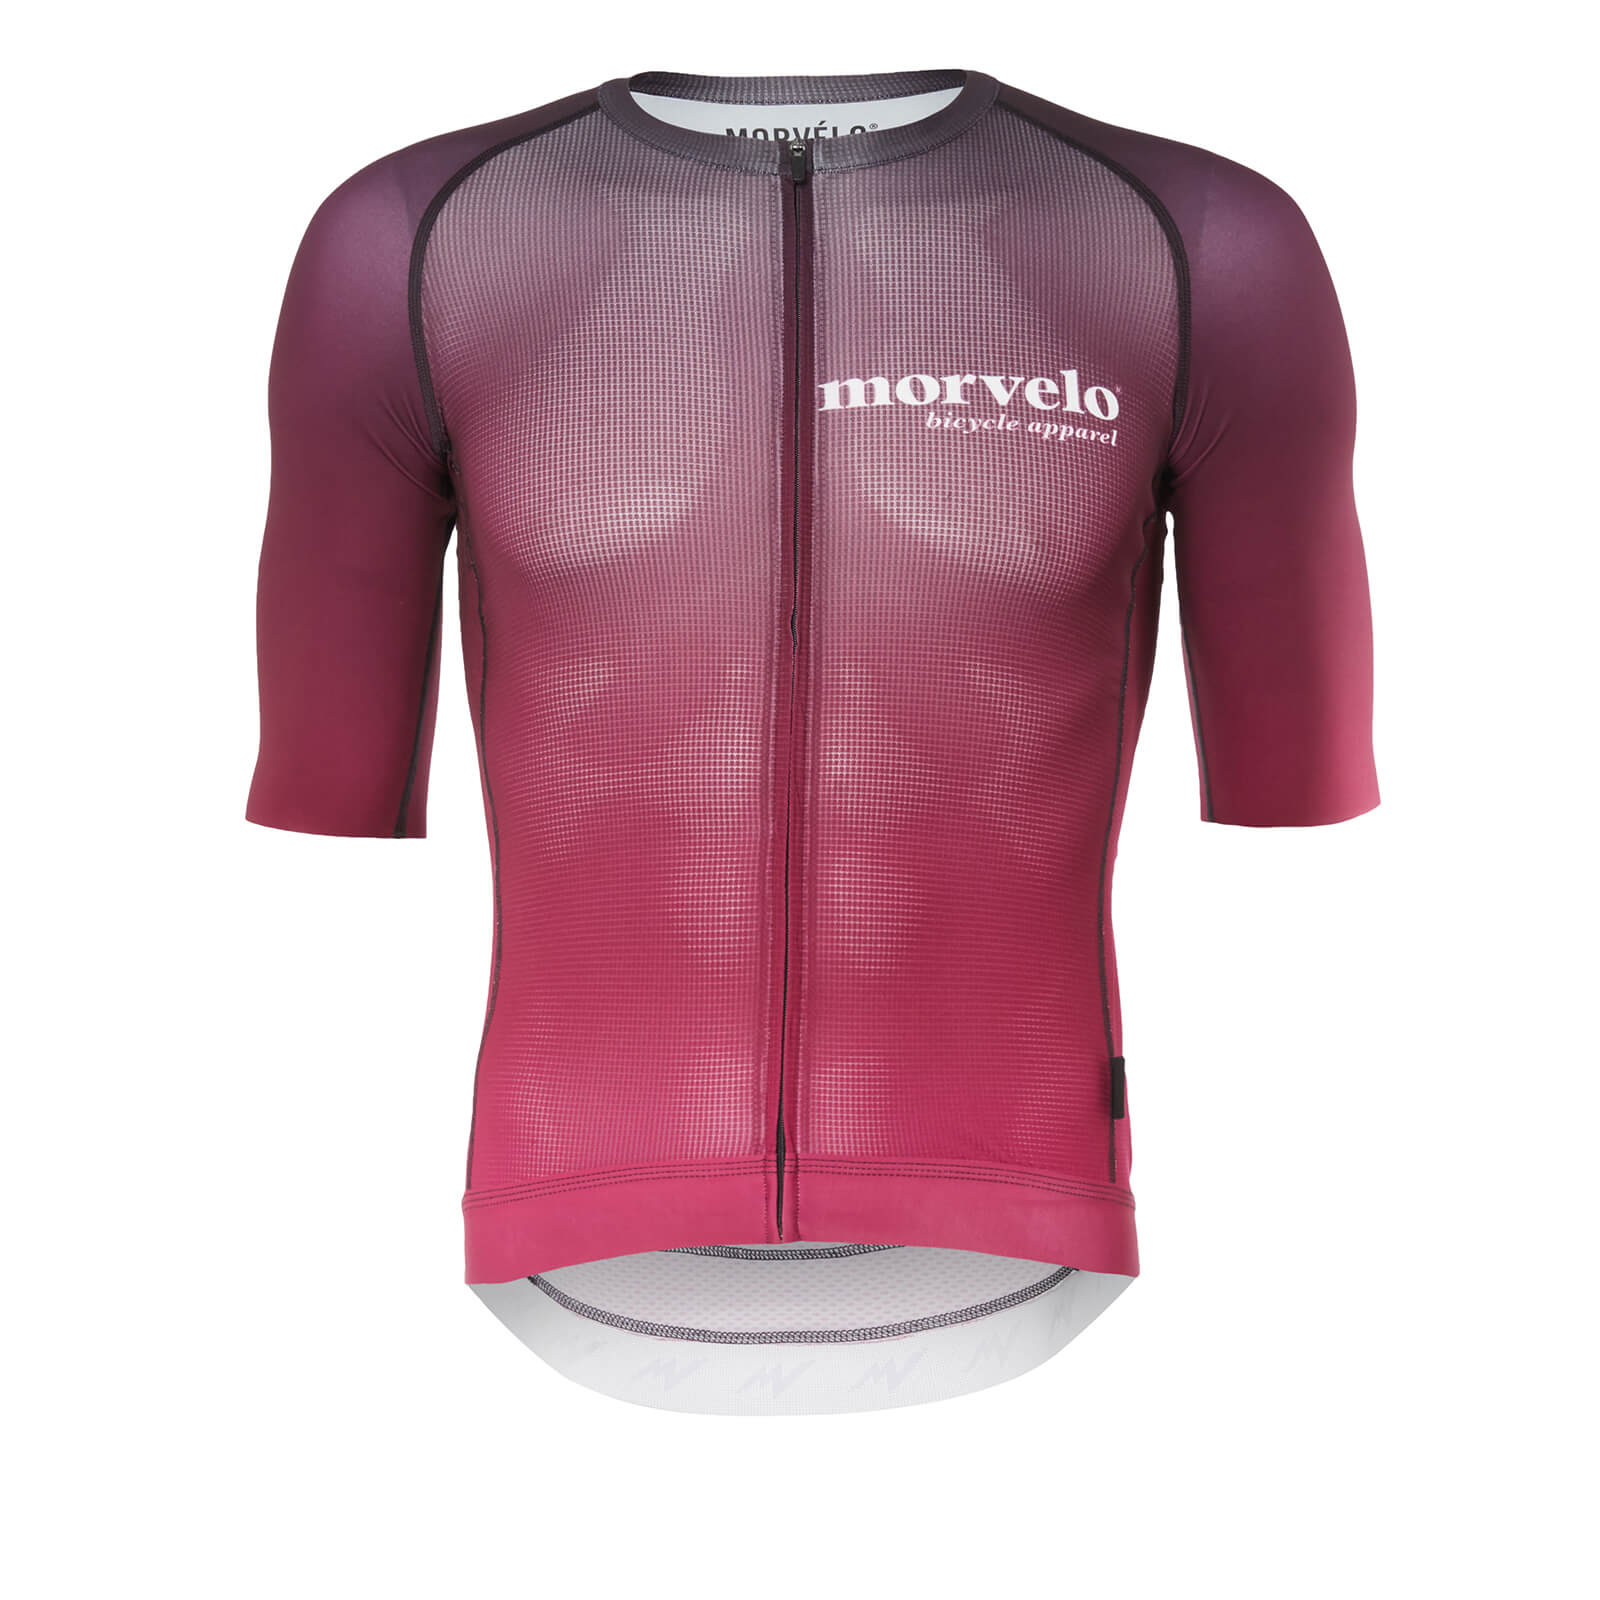 Morvelo PBK Exclusive Menu NTH Series Short Sleeve Jersey - Multi - XS